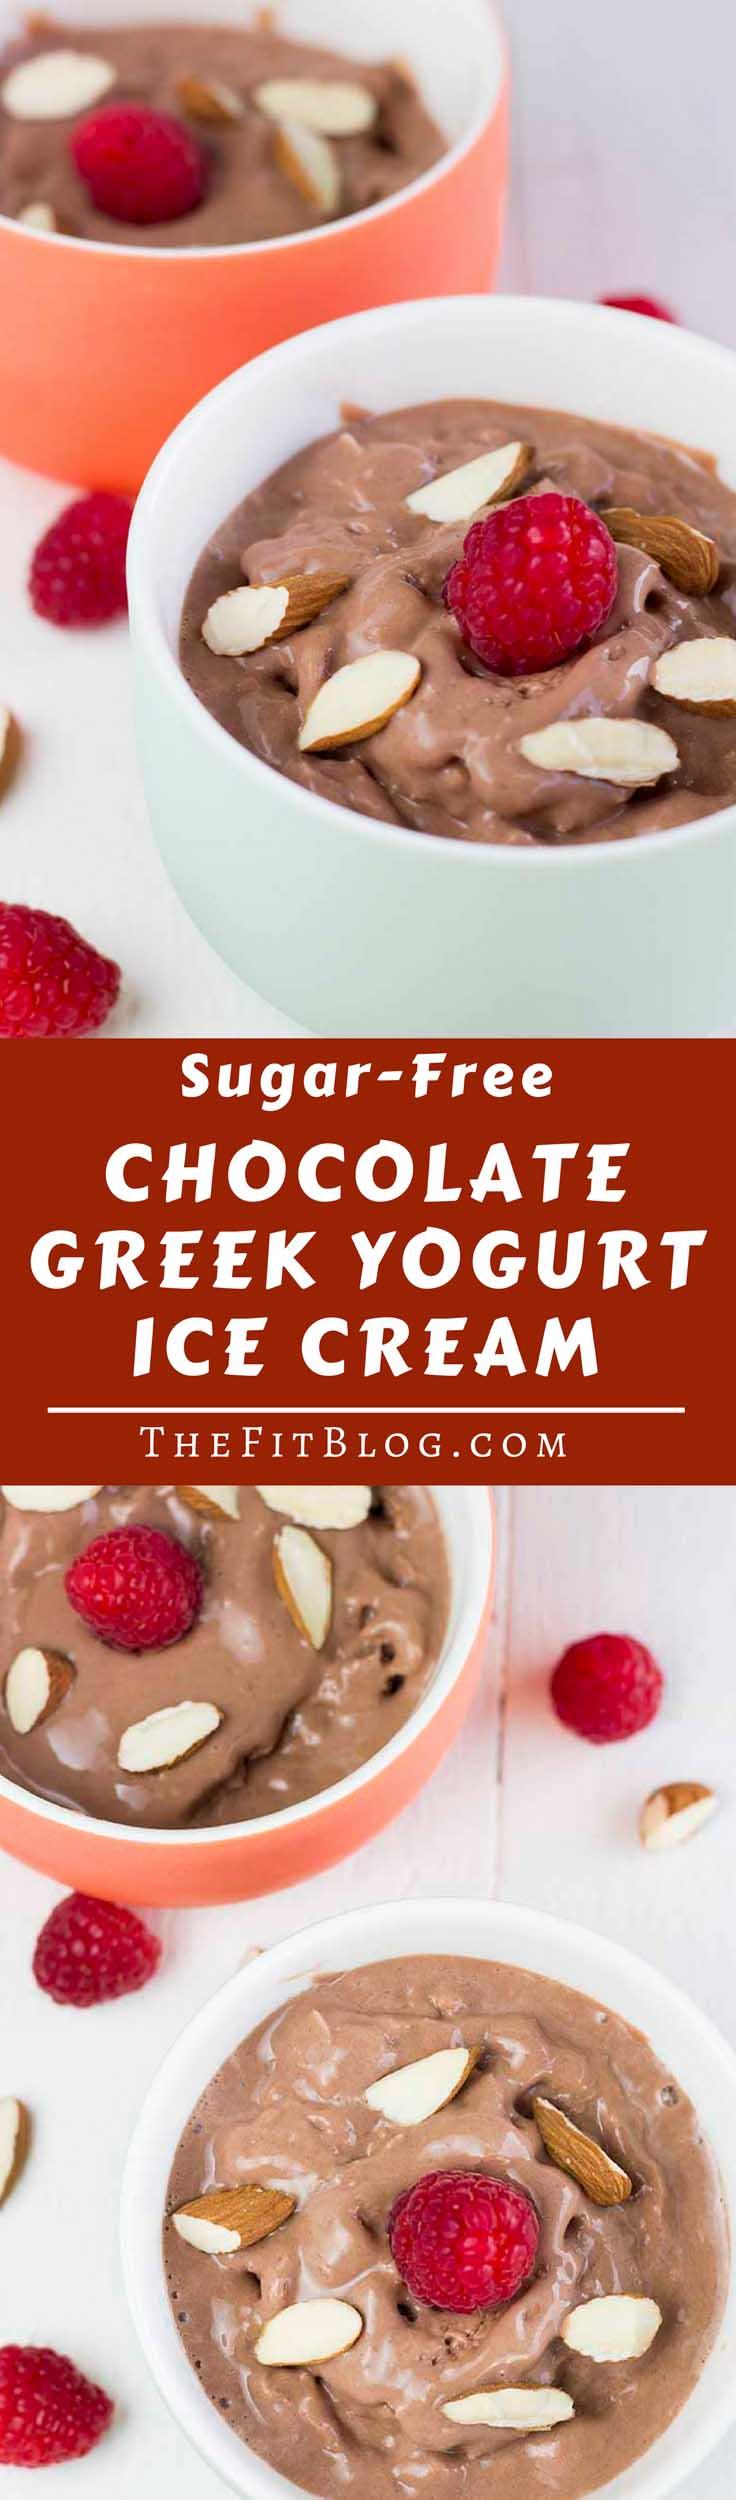 Sugar-Free Chocolate Greek Yogurt Ice Cream | TheFitBlog